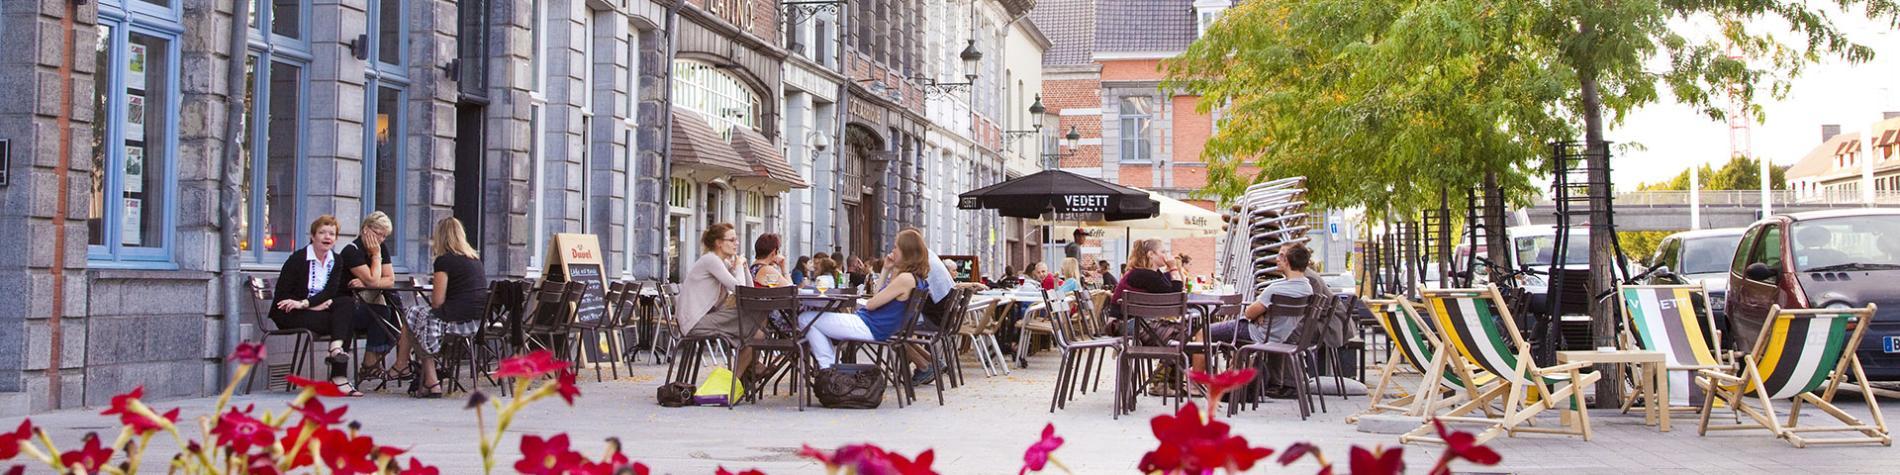 Tournai - Quai - marché au poisson